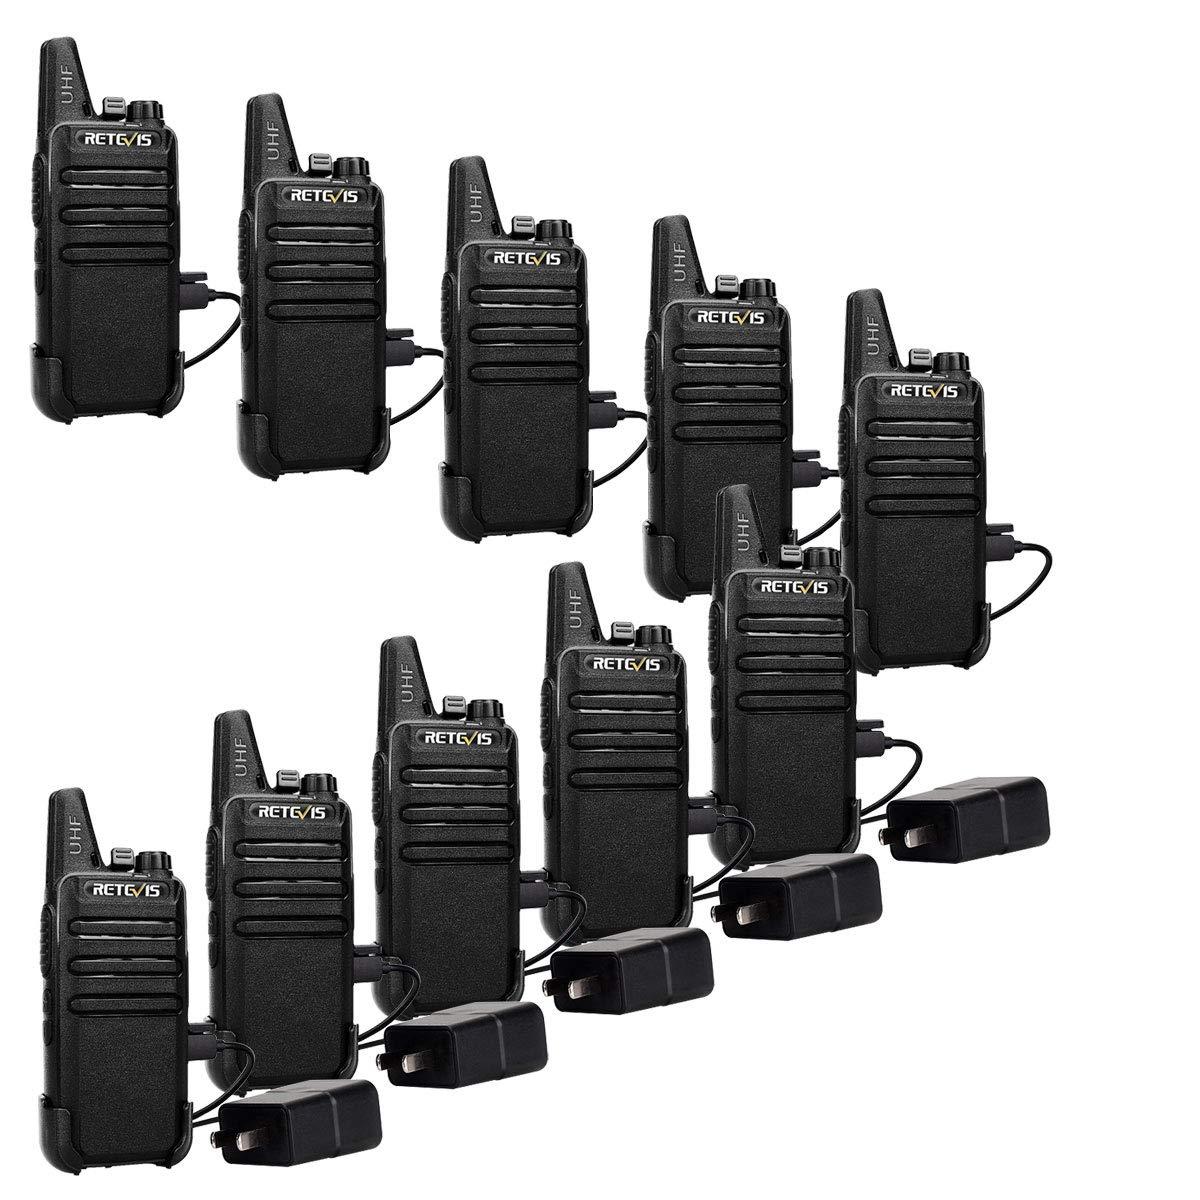 Retevis RT22 Two Way Radios Rechargeable Walkie Talkies 16 CH VOX Channel Lock Emergency Alarm 2 Way Radio(10 Pack) by Retevis